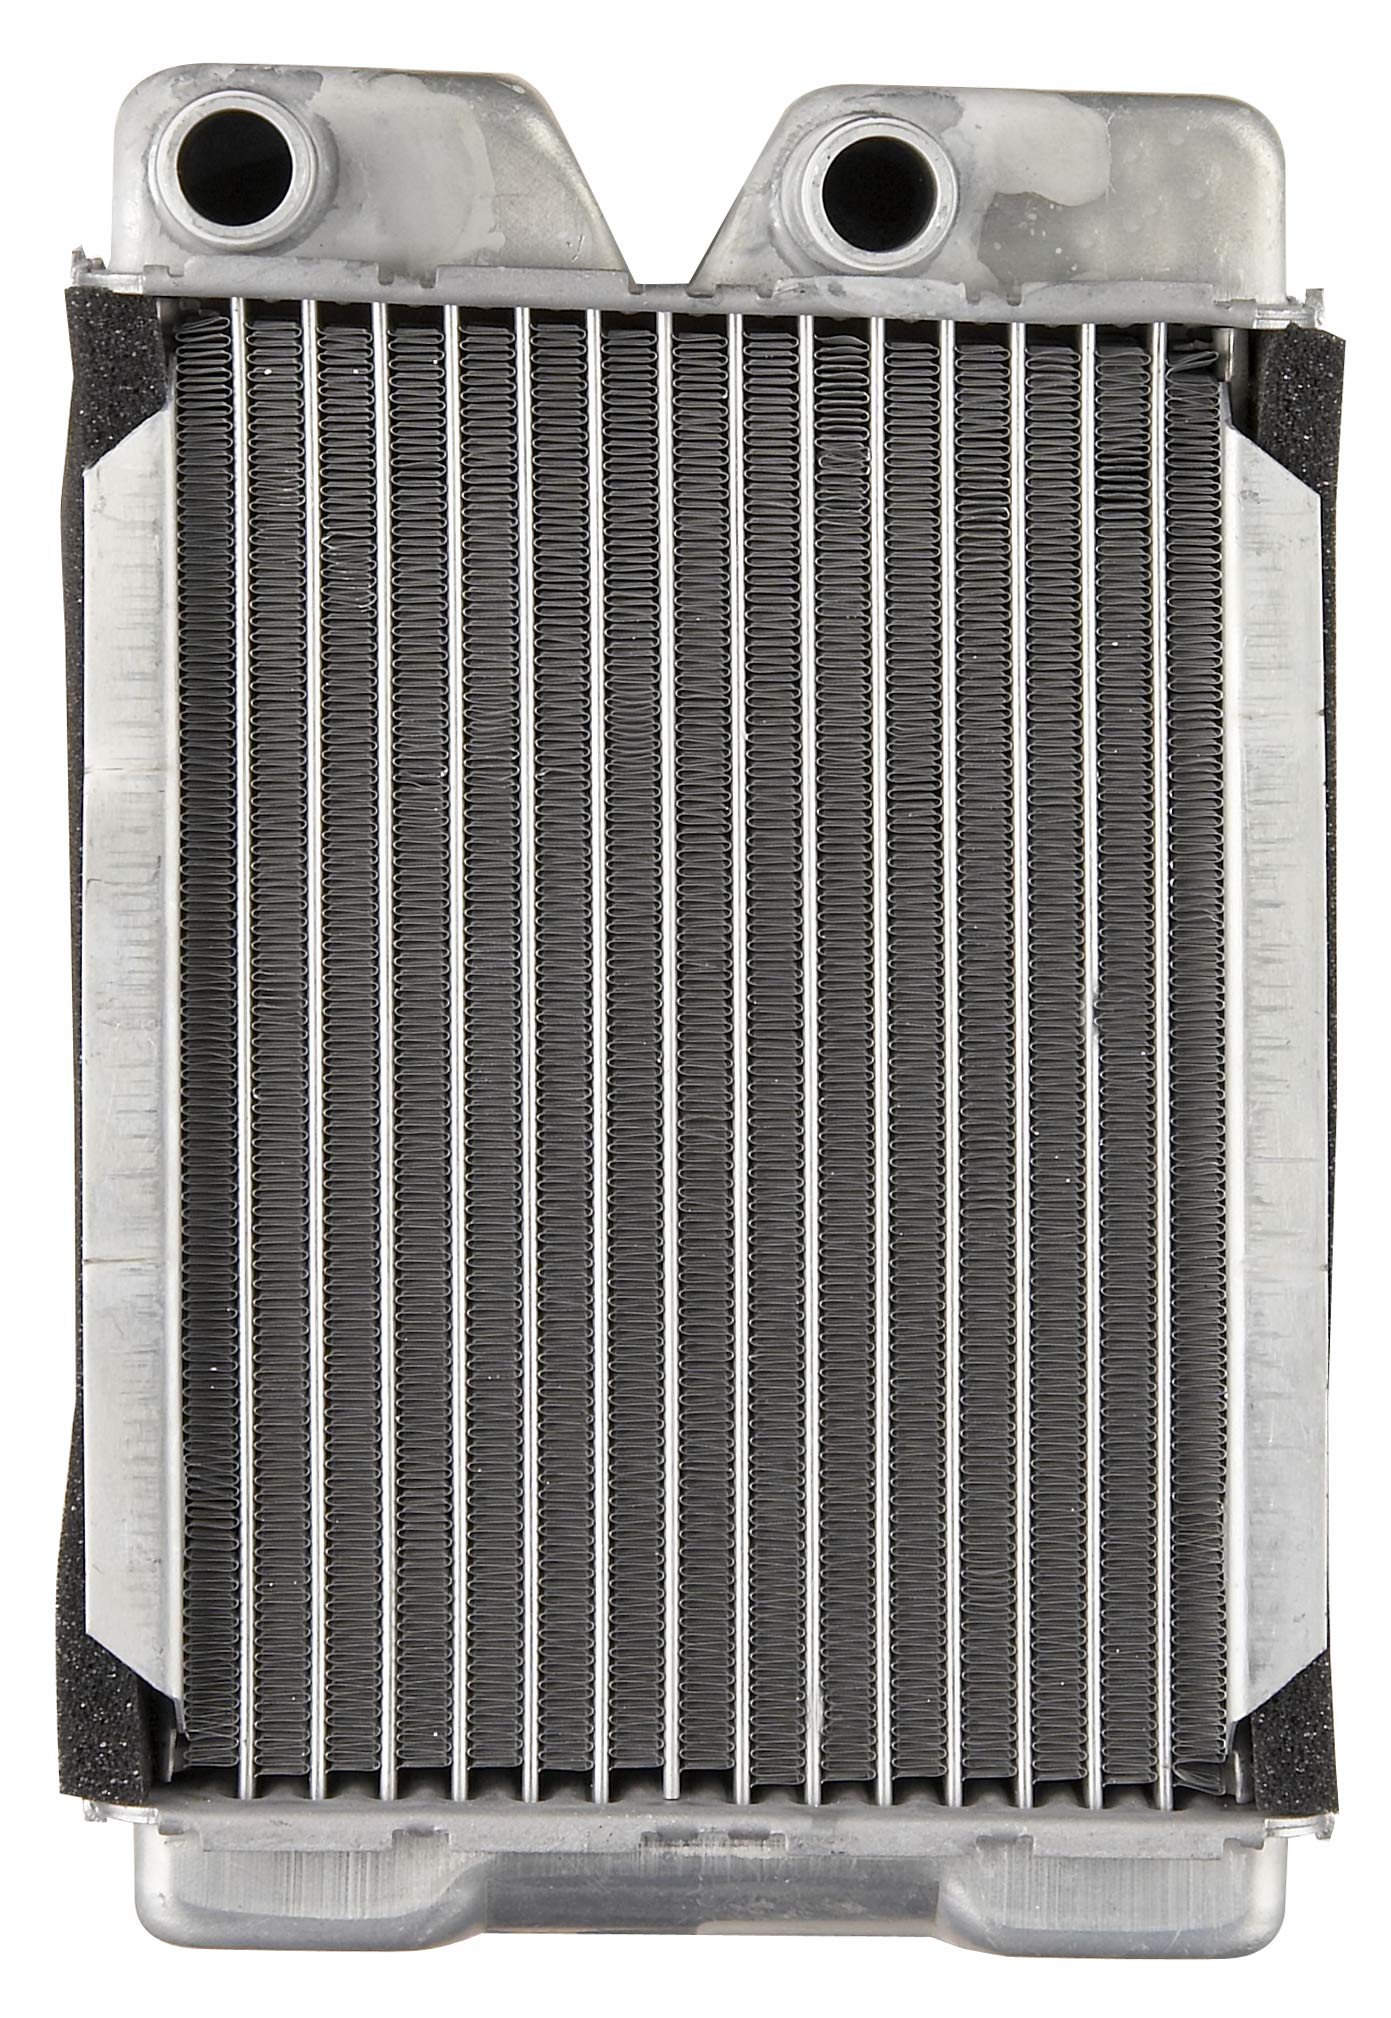 Spectra Premium 94575 Heater Core by Spectra Premium